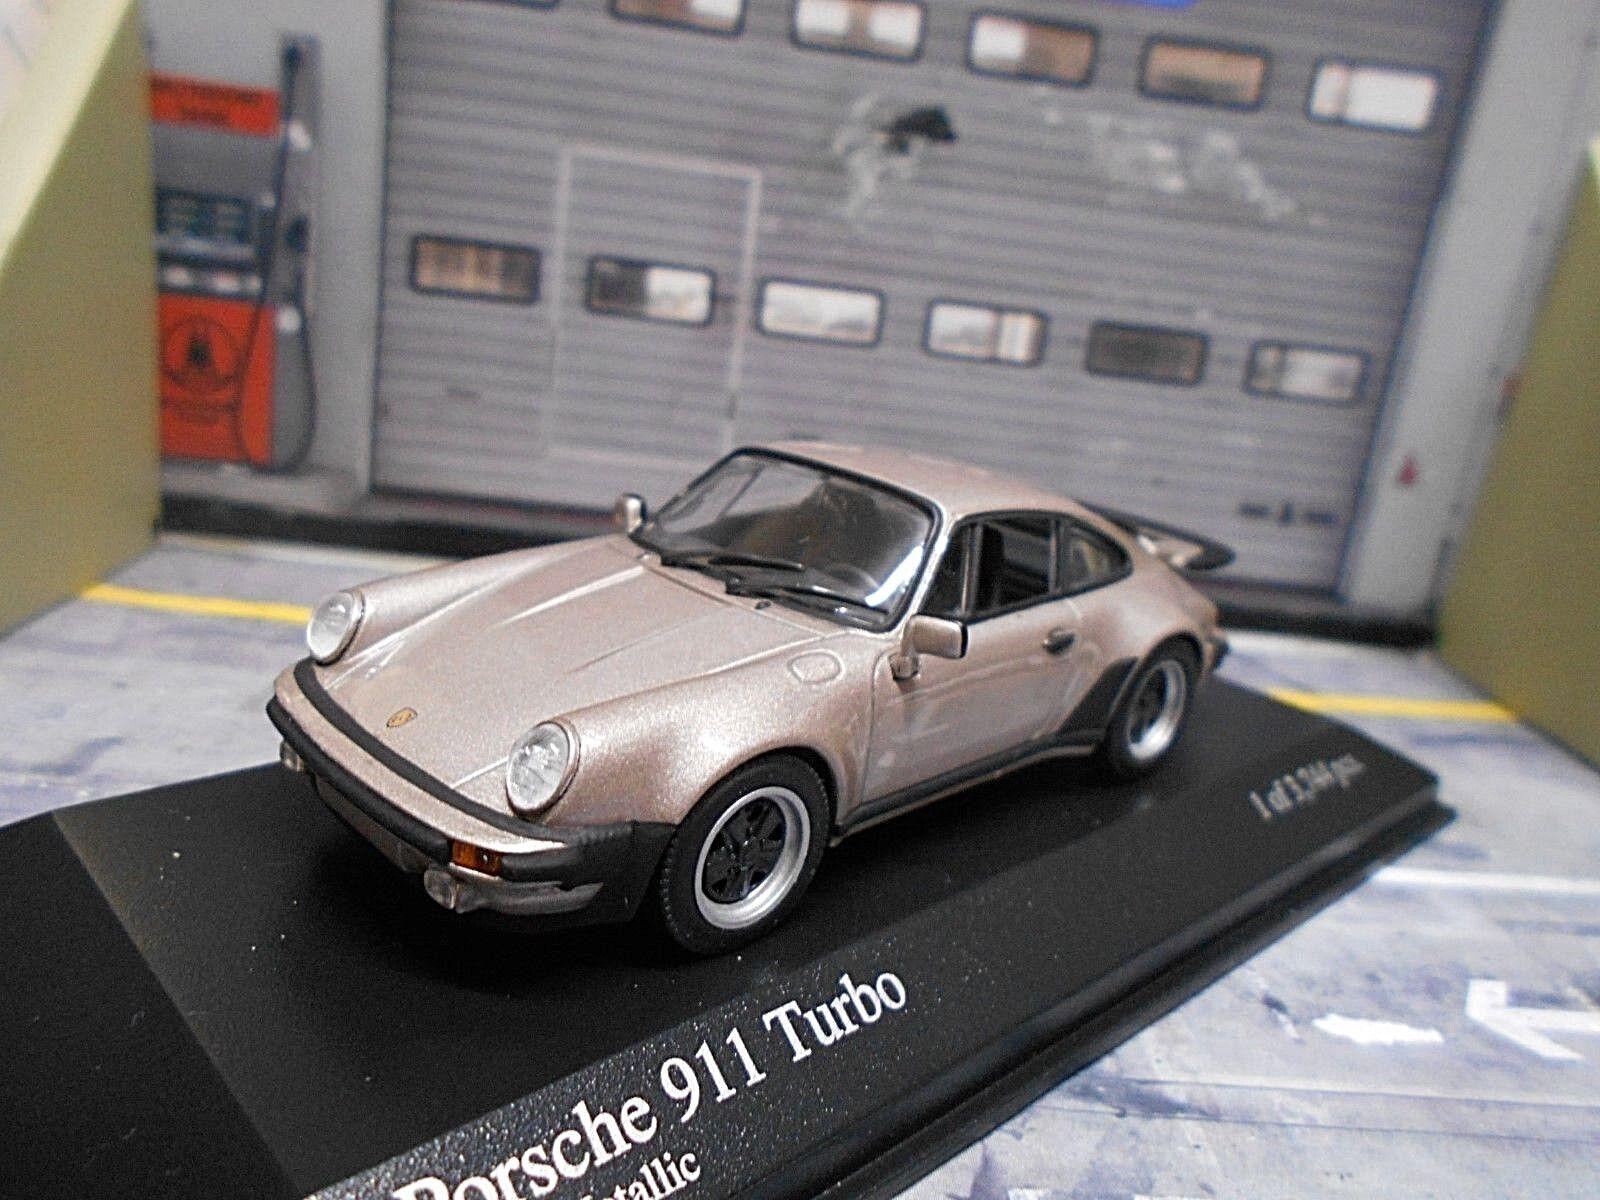 contador genuino Porsche 911 turbo 930 1977 3.0 platino gris gris gris gris met Minichamps rareza 1 43  mejor vendido